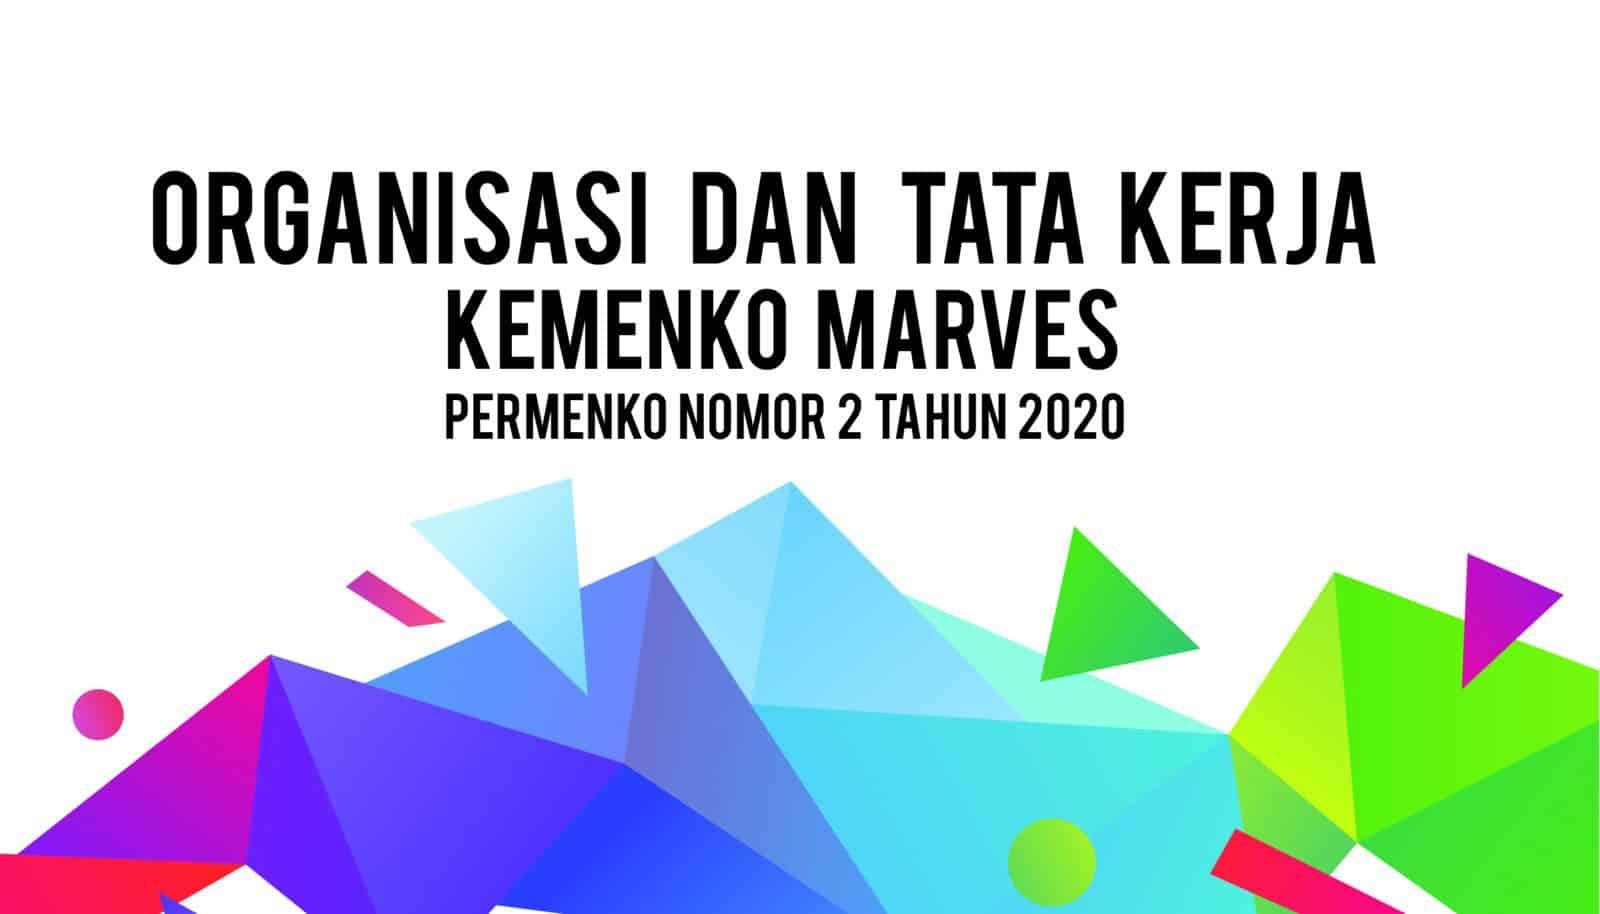 Organisasi dan Tata Kerja Kemenko Marves (Permenko Nomor 2 Tahun 2020)